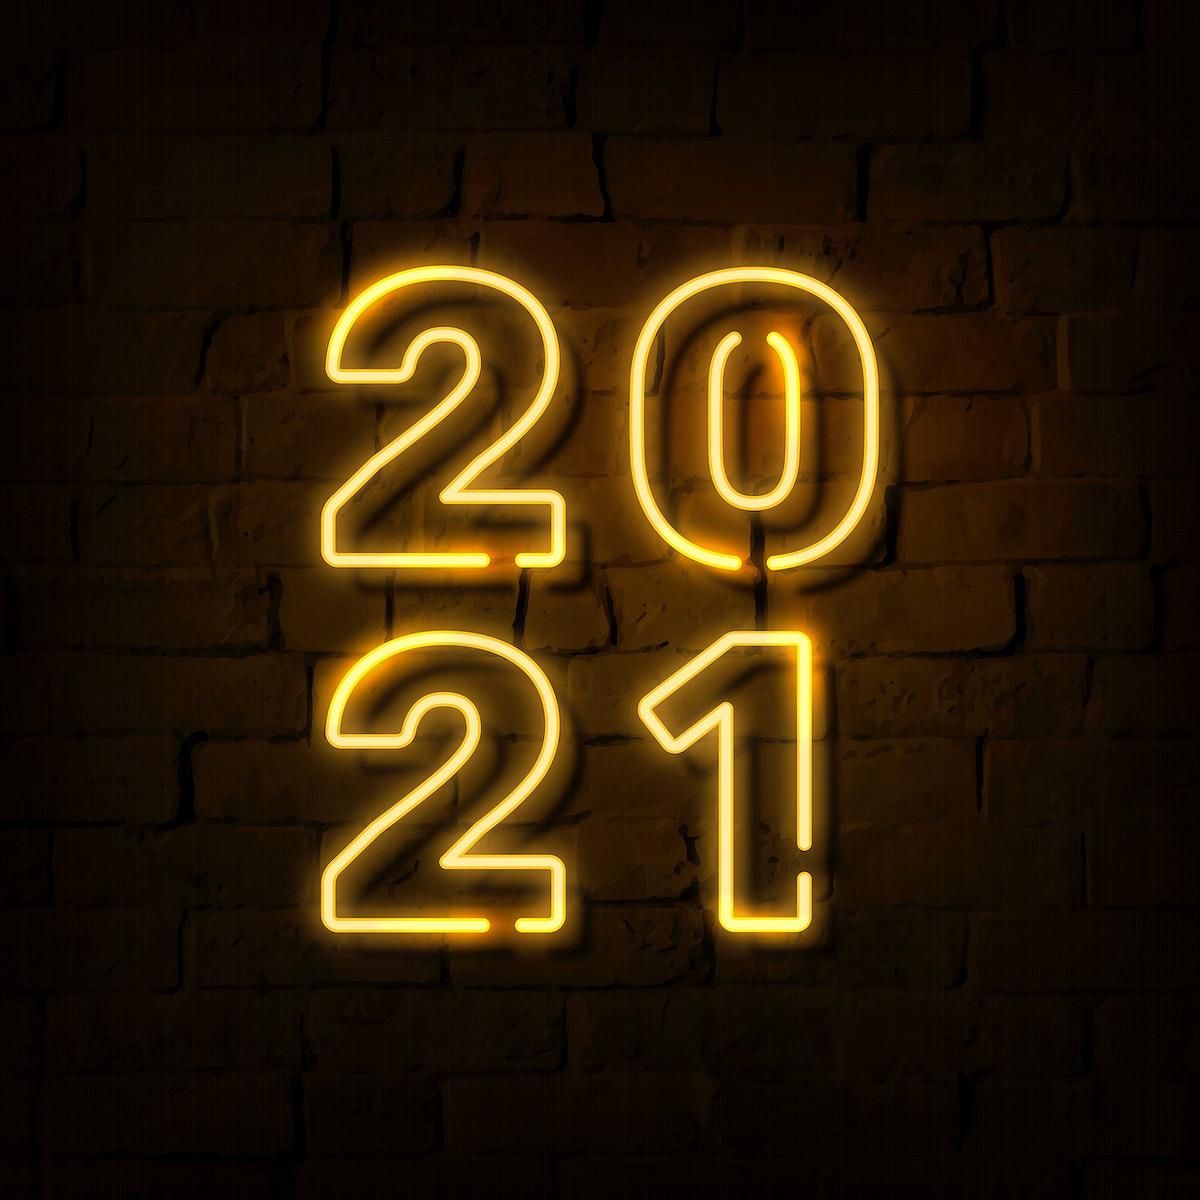 v778batch2 ning 02d 2.jpg?w=1200&h=1200&dpr=1&fit=clip&crop=default&fm=jpg&q=75&vib=3&con=3&usm=15&cs=srgb&bg=F4F4F3&ixlib=js 2.2